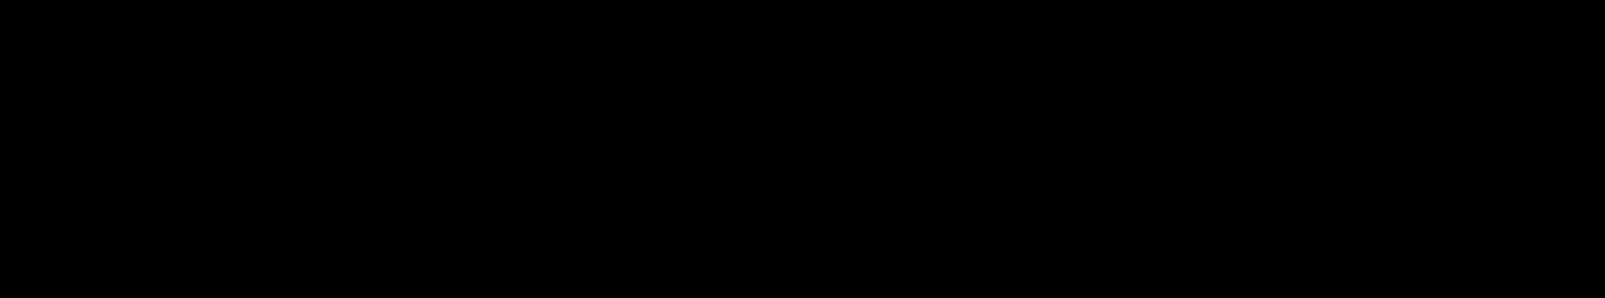 بونيسو